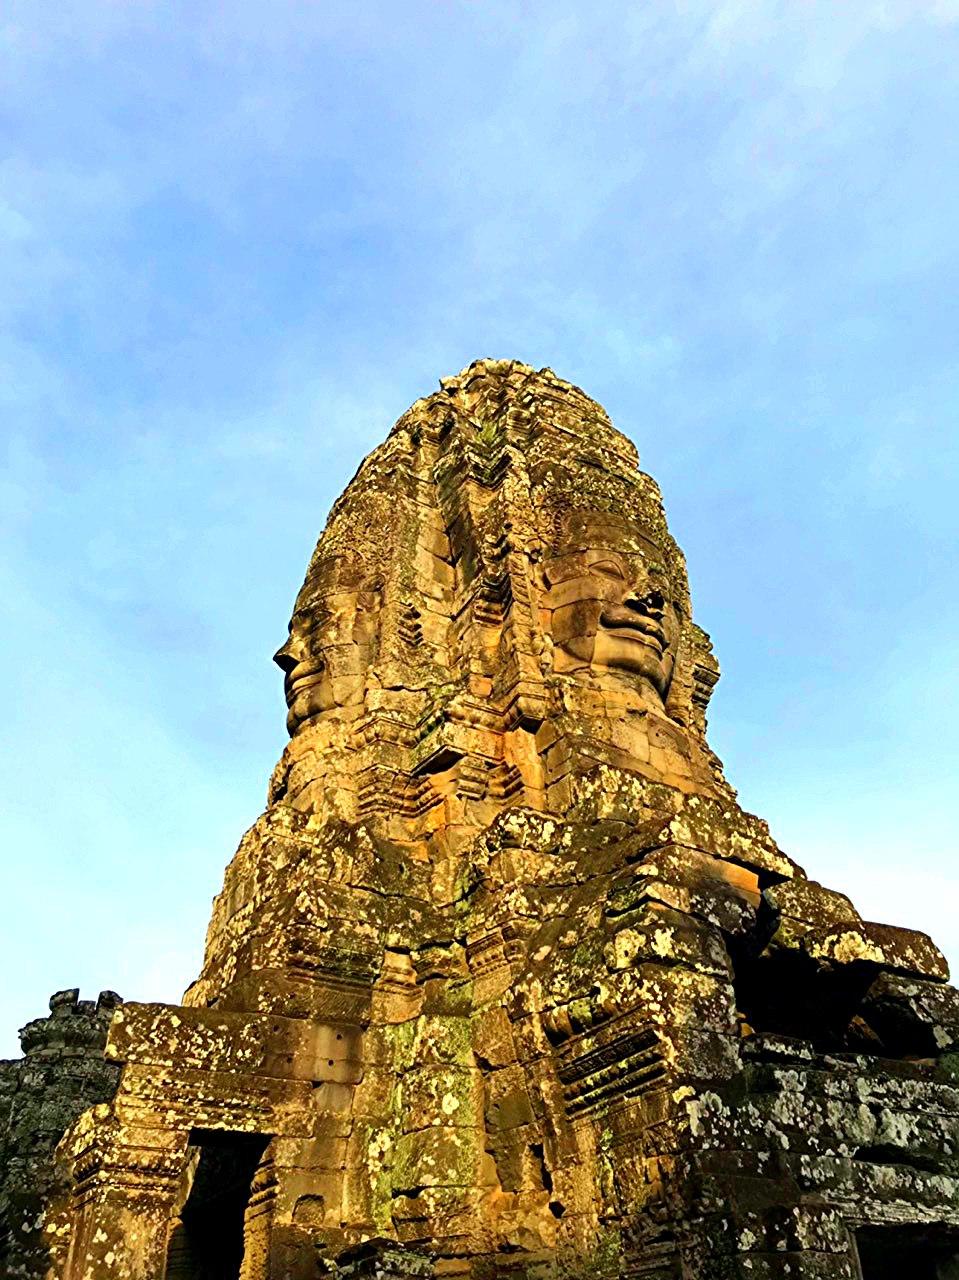 Елена Руденко (Валтея). Камбоджа. Ангкор. - Страница 2 X9hosj3wvv4